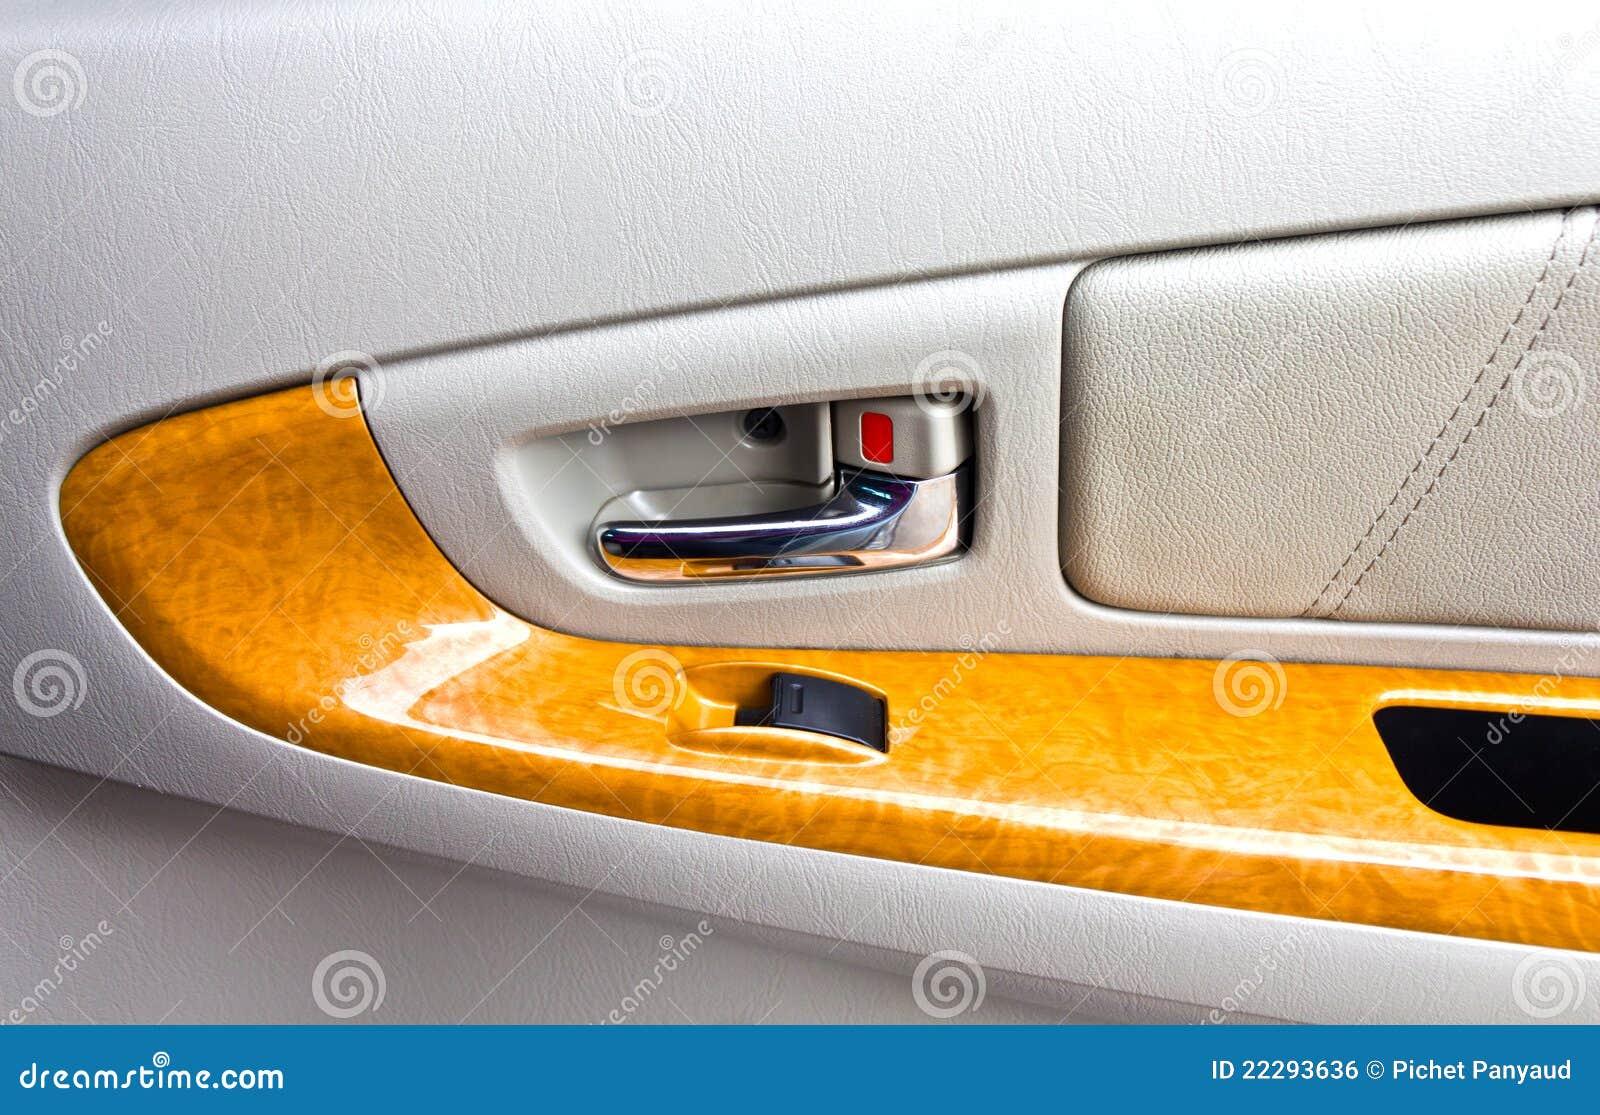 interior panel of car door royalty free stock image image 22293636. Black Bedroom Furniture Sets. Home Design Ideas